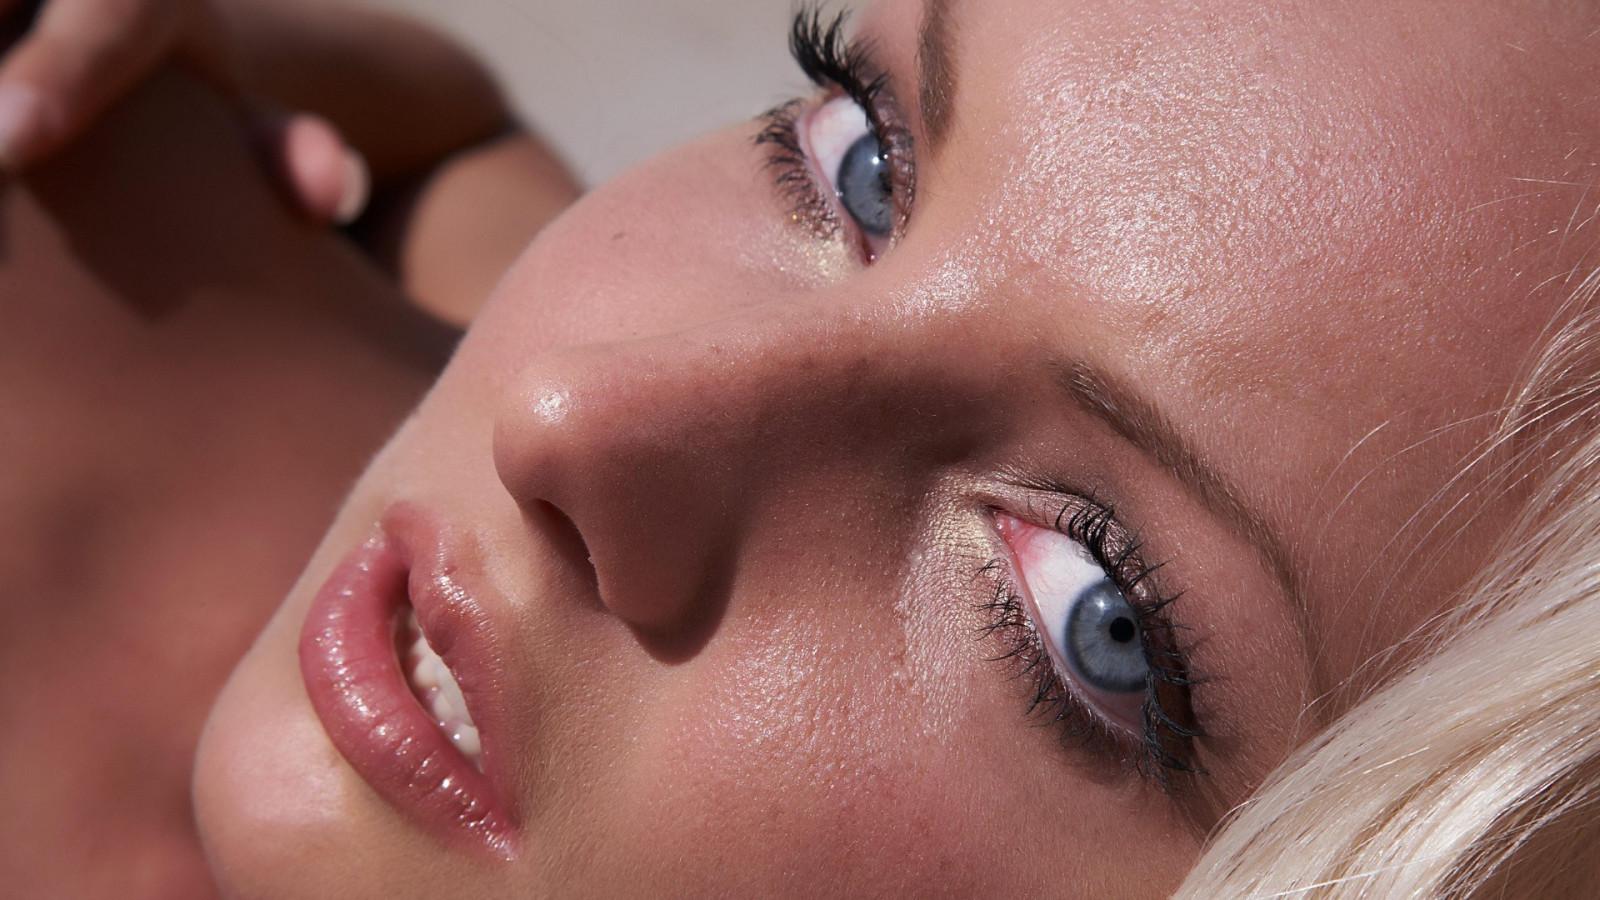 Подборки сперма на лицо фото — 5